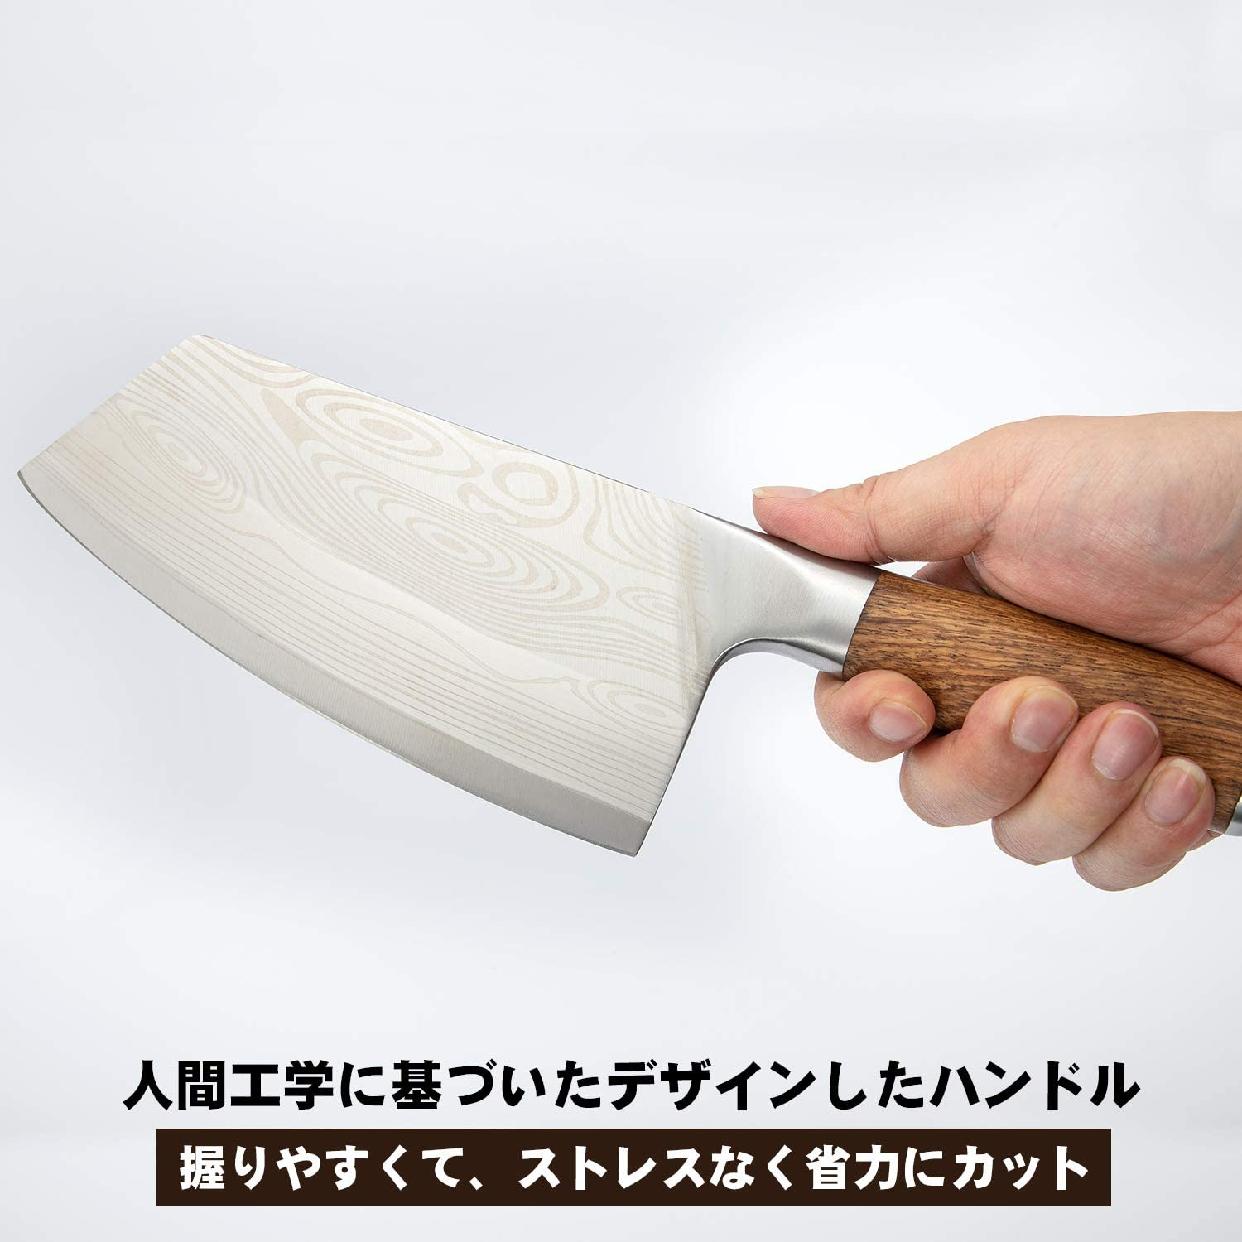 MUKAI(ムカイ) ステンレス キッチンナイフ 20cmの商品画像5